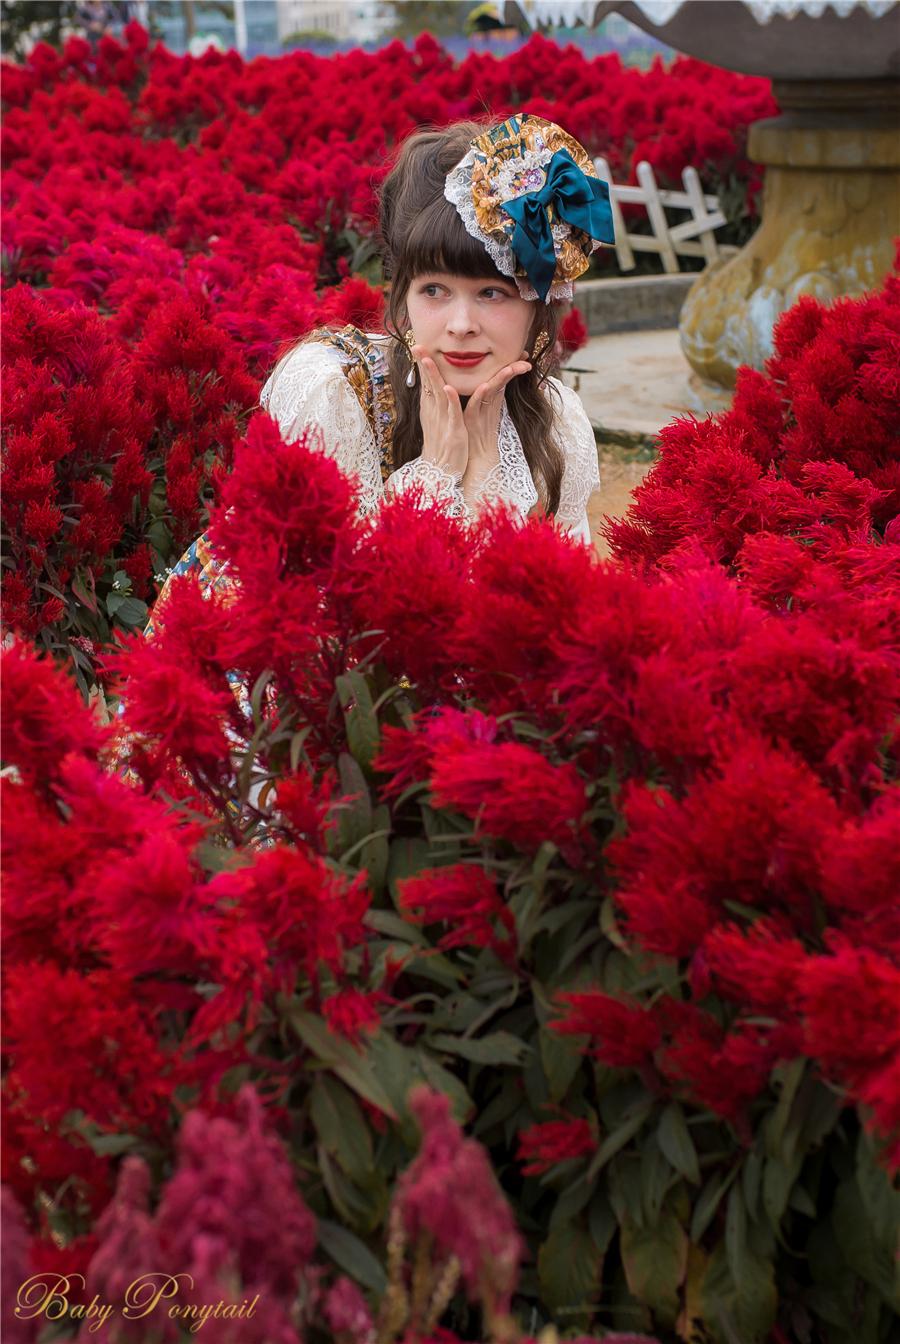 Babyponytail_Model_JSK_Tiel Present Angel_Claudia_2_04.jpg